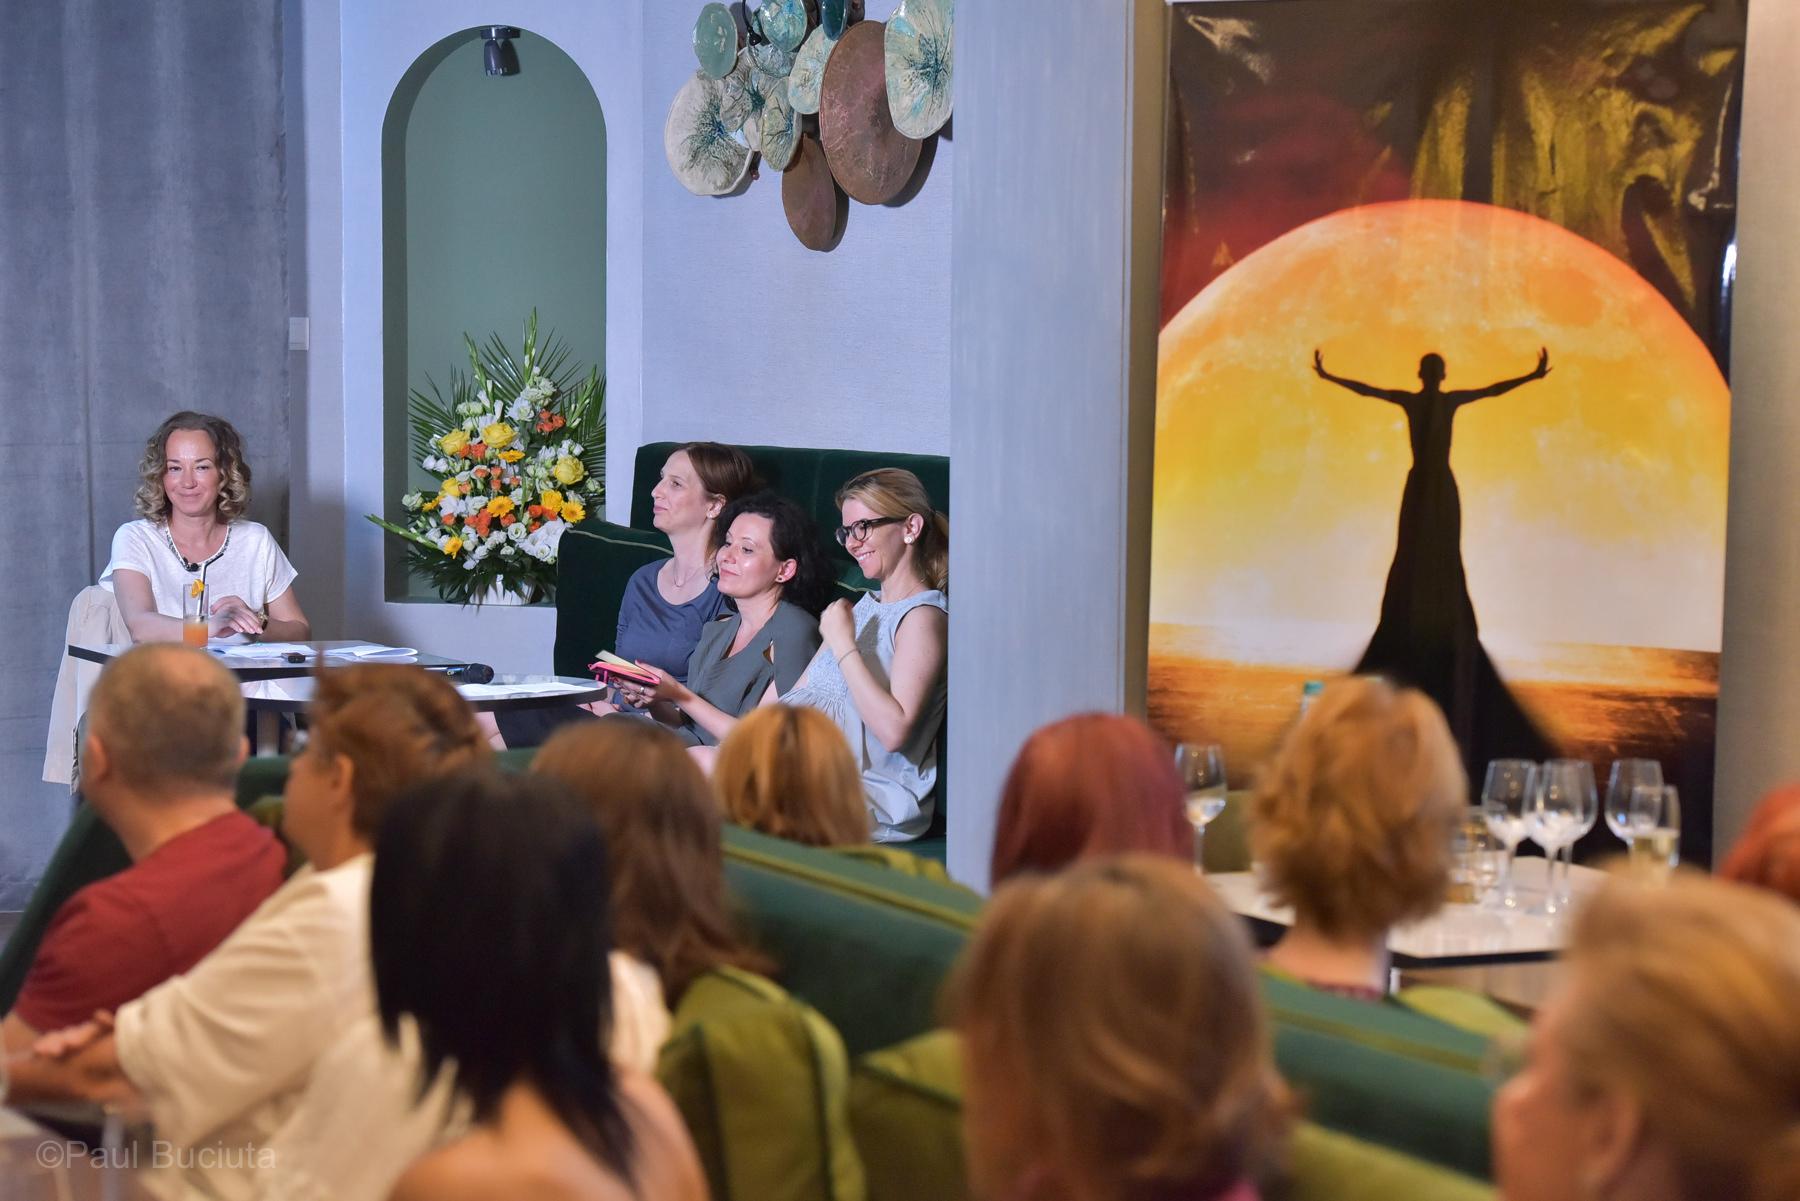 Marina Constantinescu a anunțat selecția FNT 2018. In imagine: Marina Constantinescu, actrita Ozana Oancea, teatrolog Oana Bors, coregrafa Oana Răsuceanu